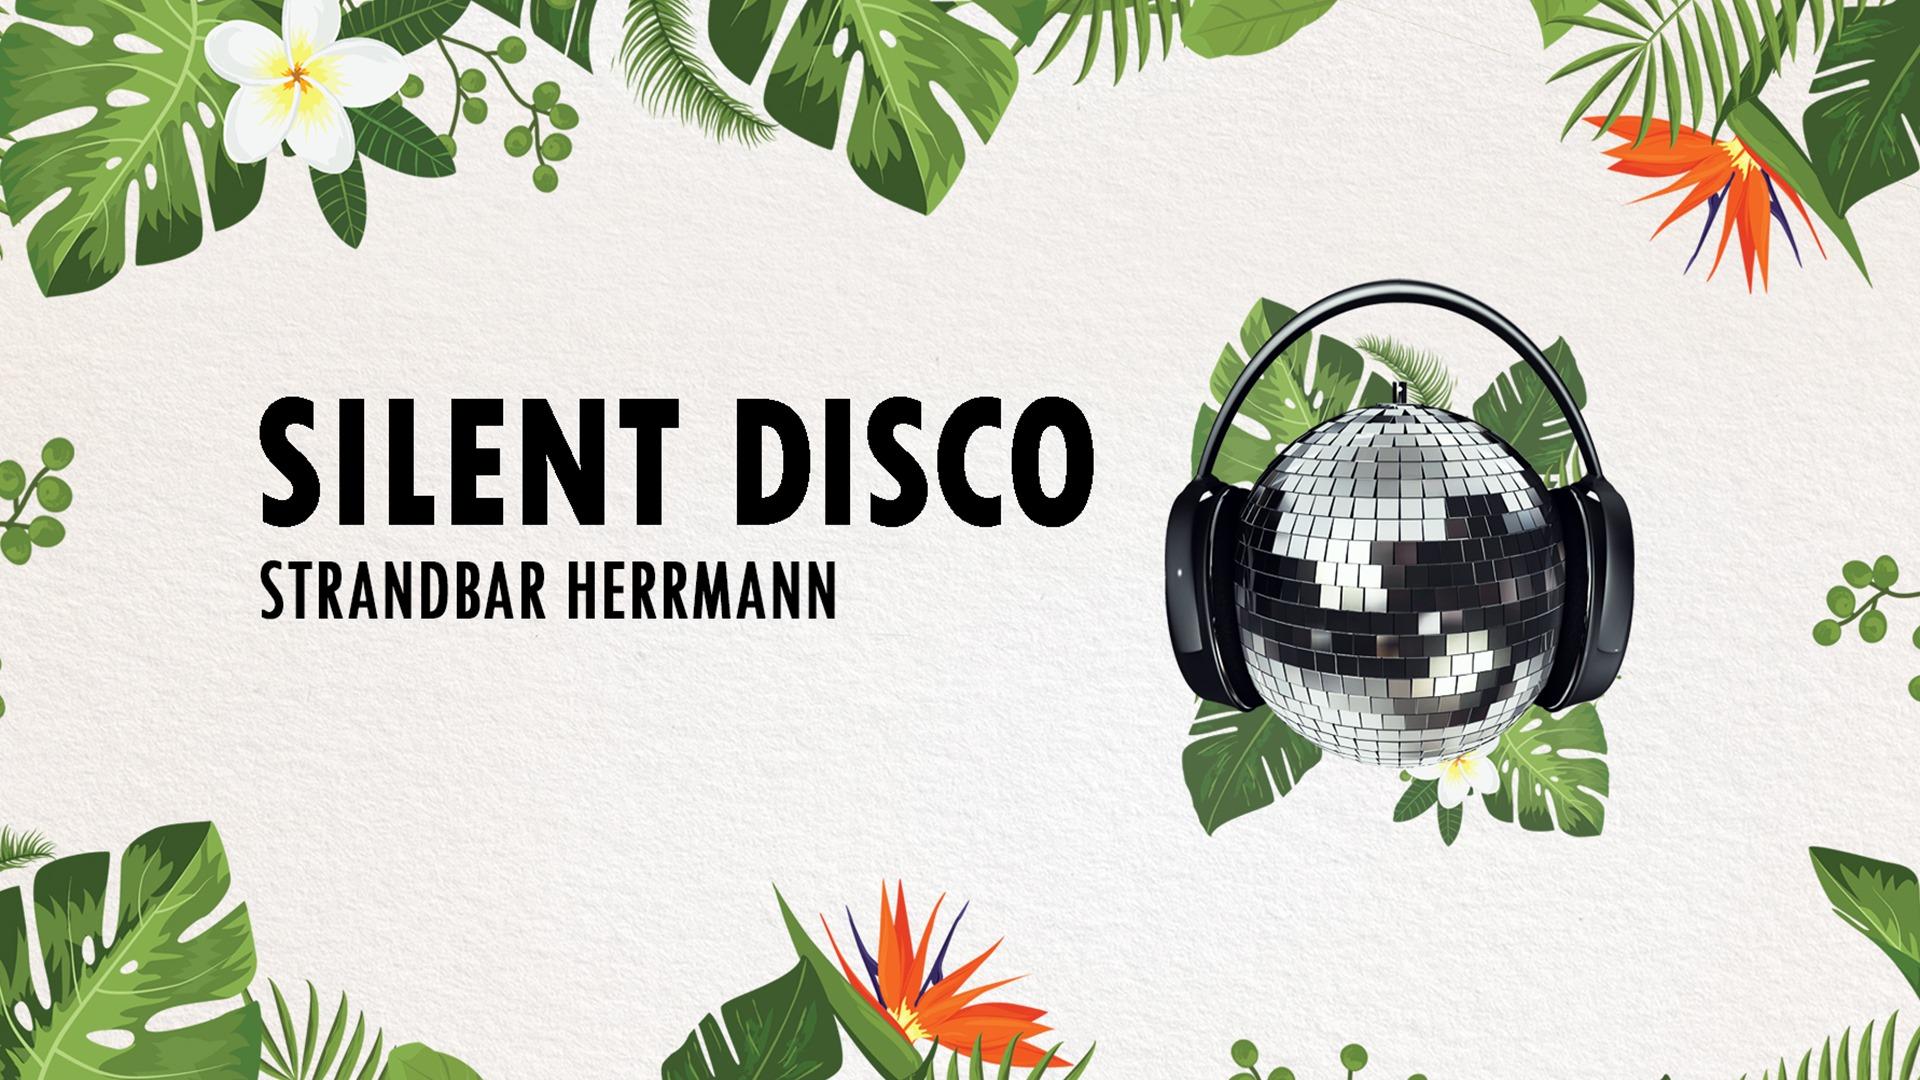 Events Wien: Silent Disco | Wien – Strandbar Herrmann